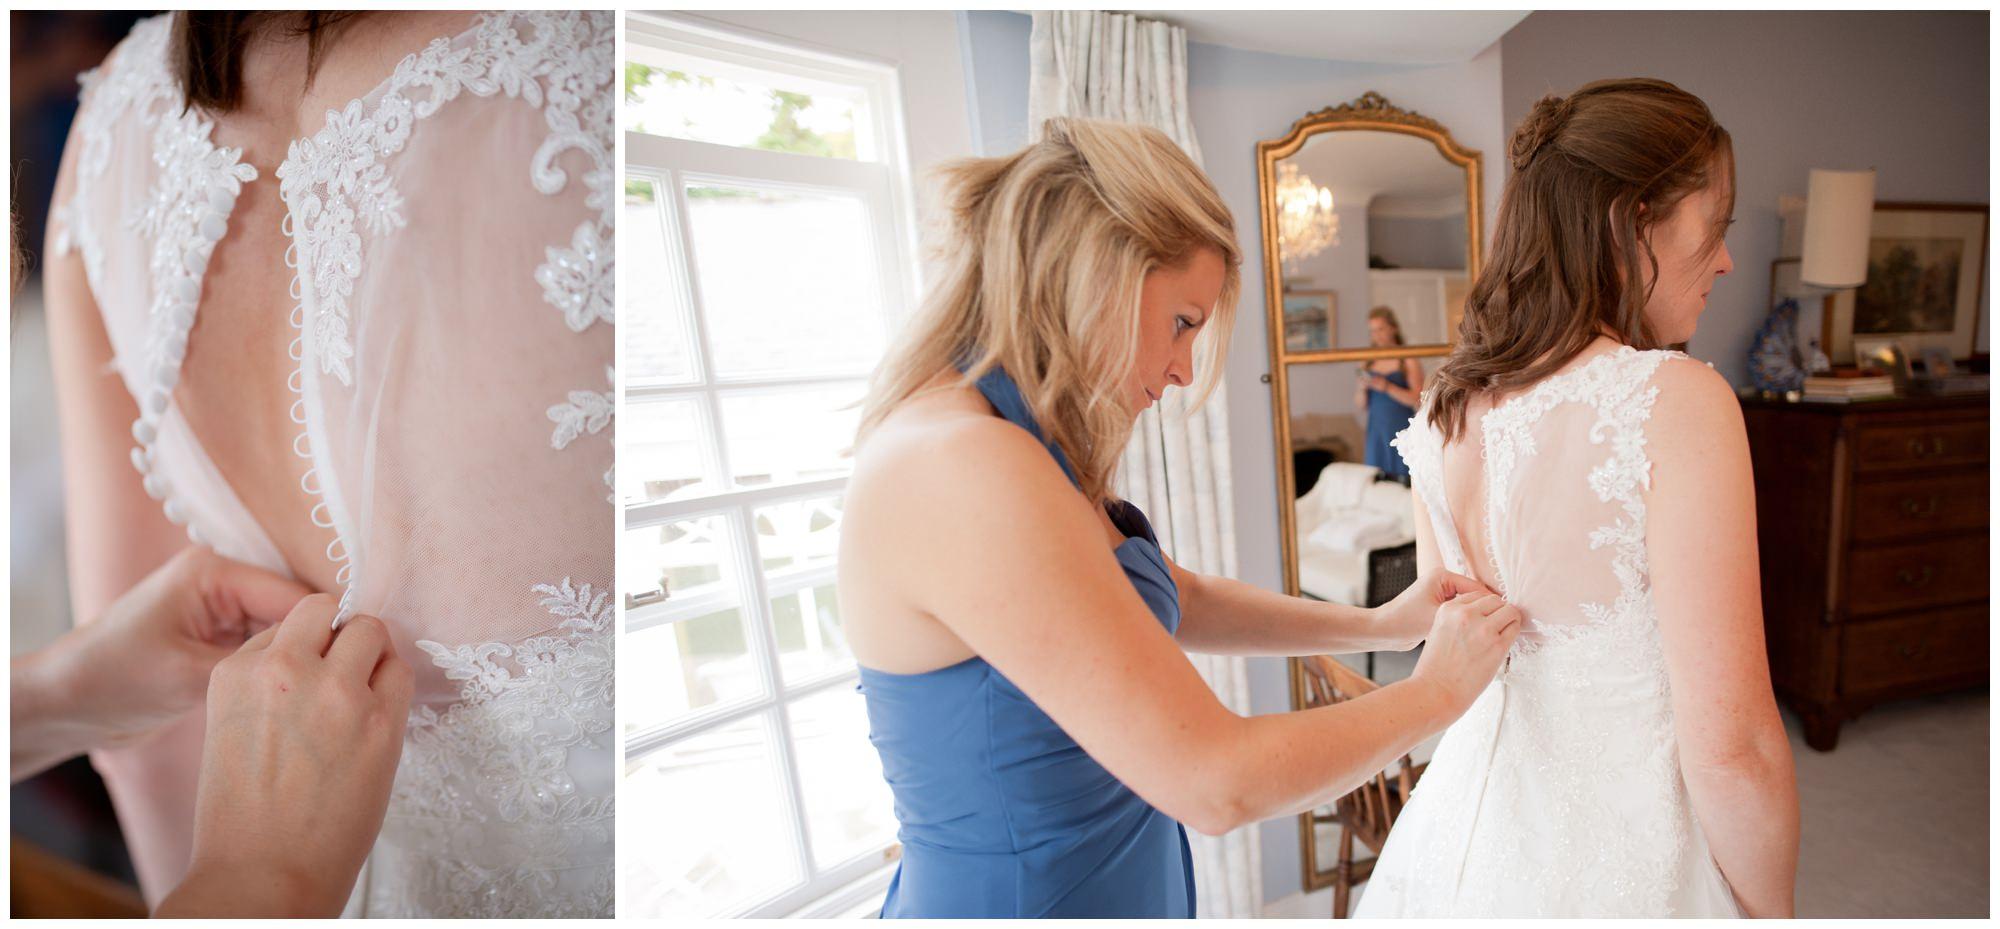 Putting on a wedding dress